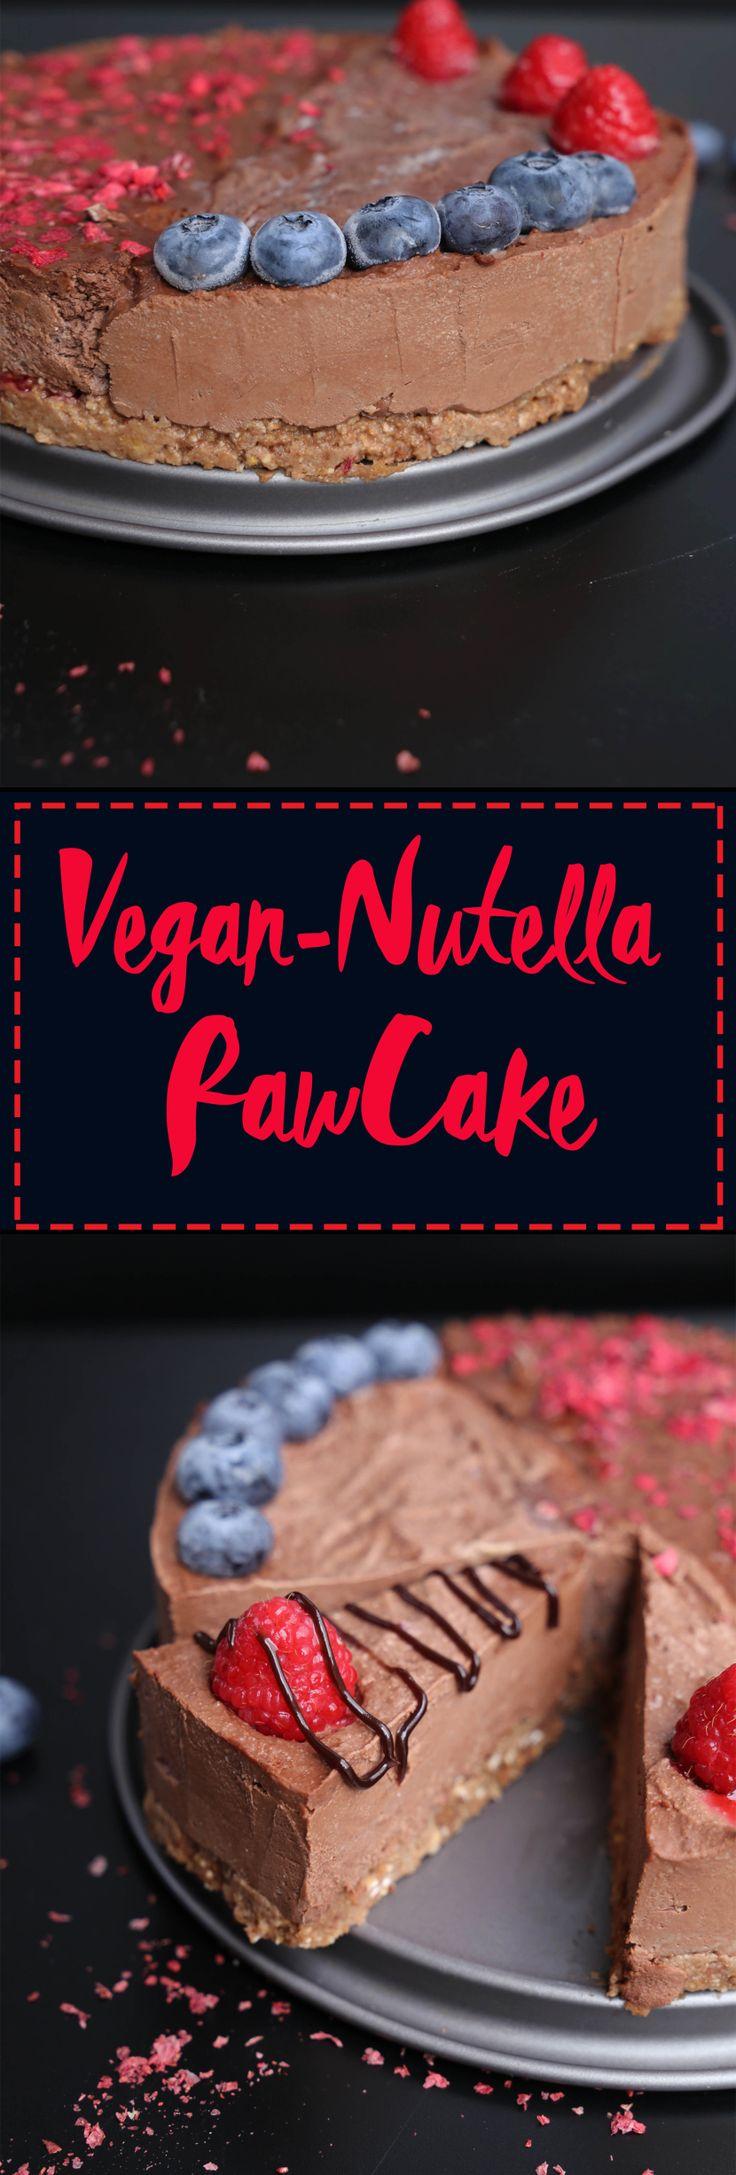 The best Nutella Raw Cake - Vegan, no refined sugar